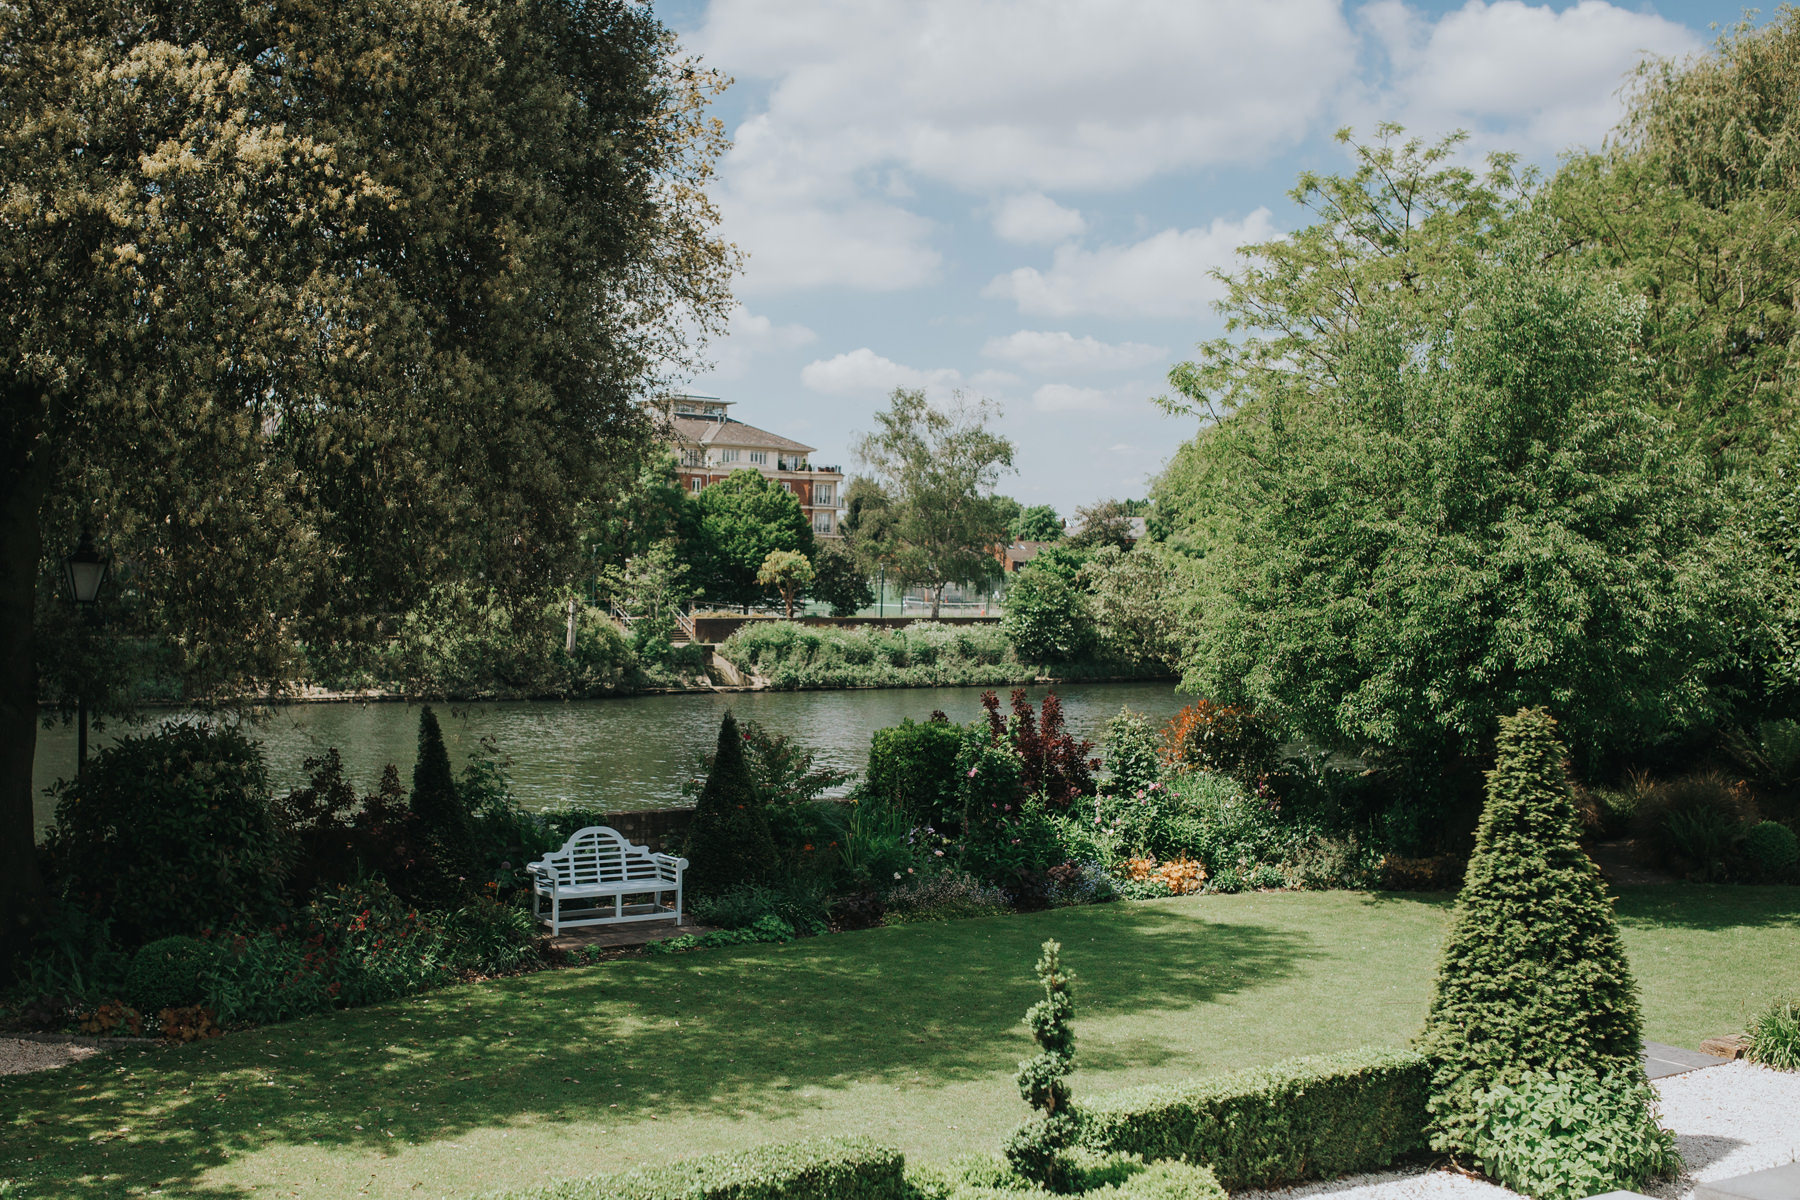 Richmond-Wedding Photographer-The Bingham riverside wedding venue London-CRL-81.jpg